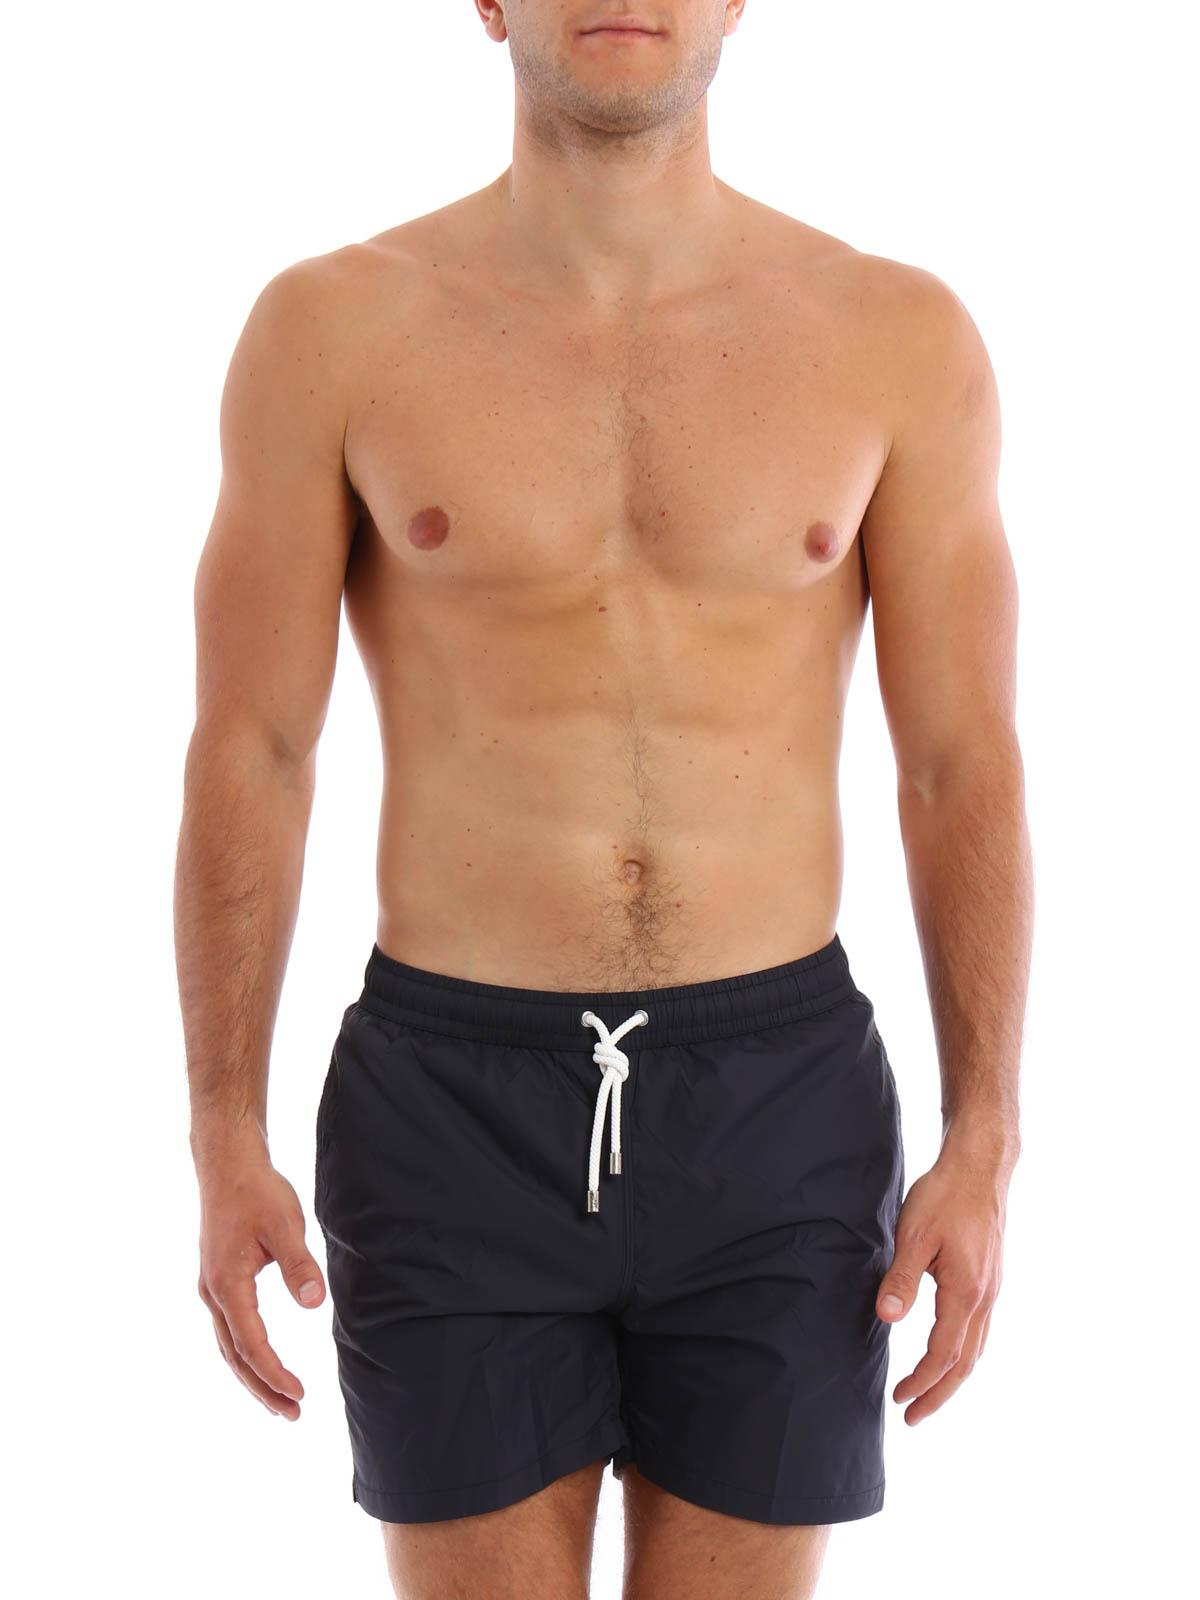 a2f72e91fc HARTFORD: Swim shorts & swimming trunks online - Ultralight nylon swim  shorts